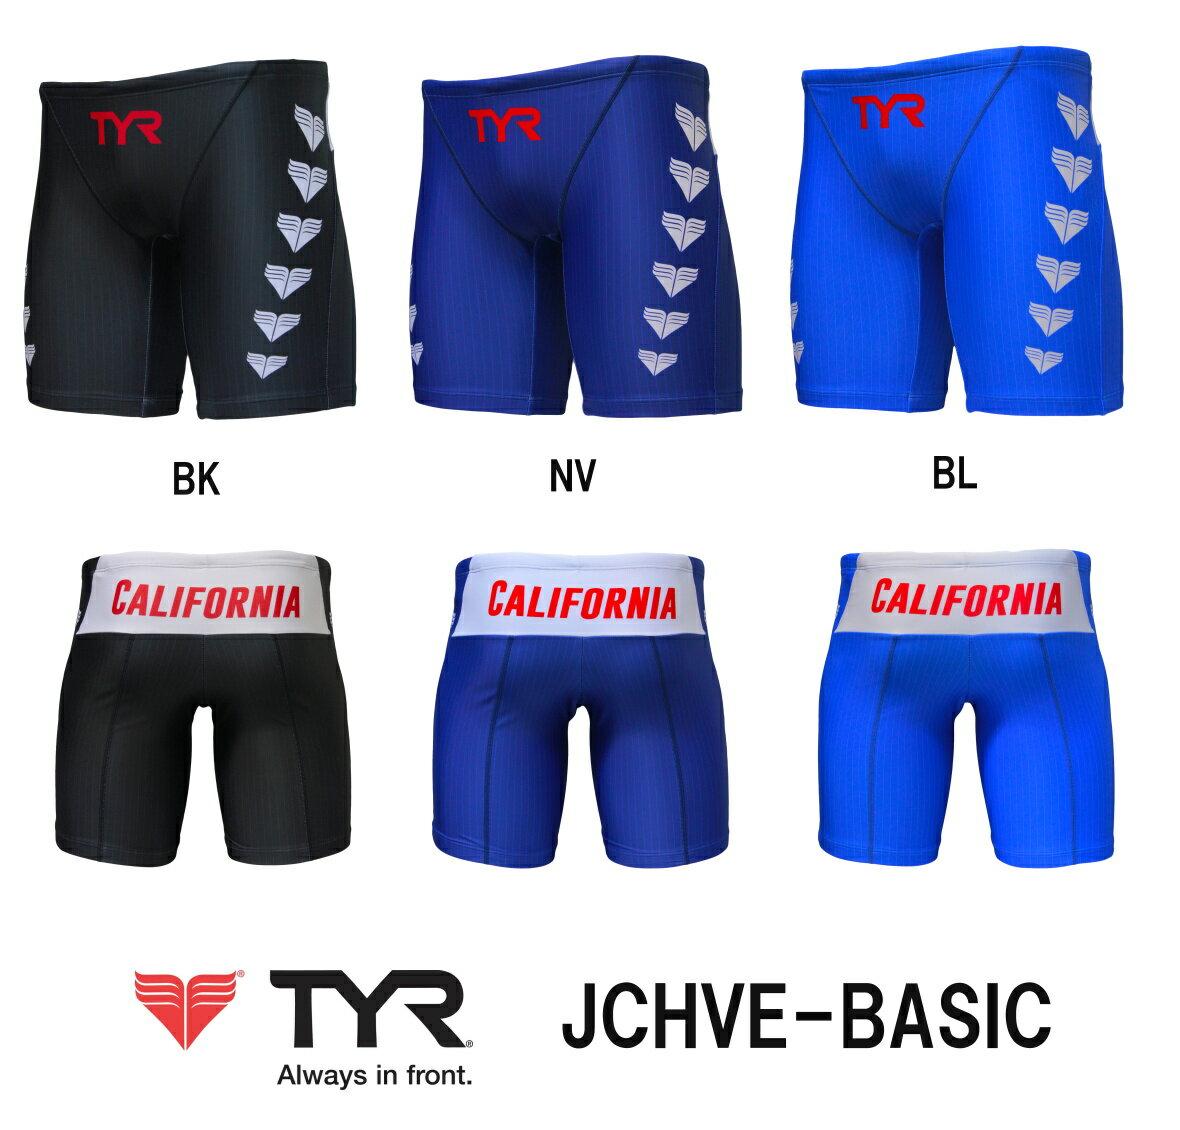 TYR ティア トレーニング水着 メンズ スイムウェア スイミングメンズ スイムウェア スイミングロングボクサー ANYTIME CHEVRON エニィタイム シェブロン JCHVE-BASIC